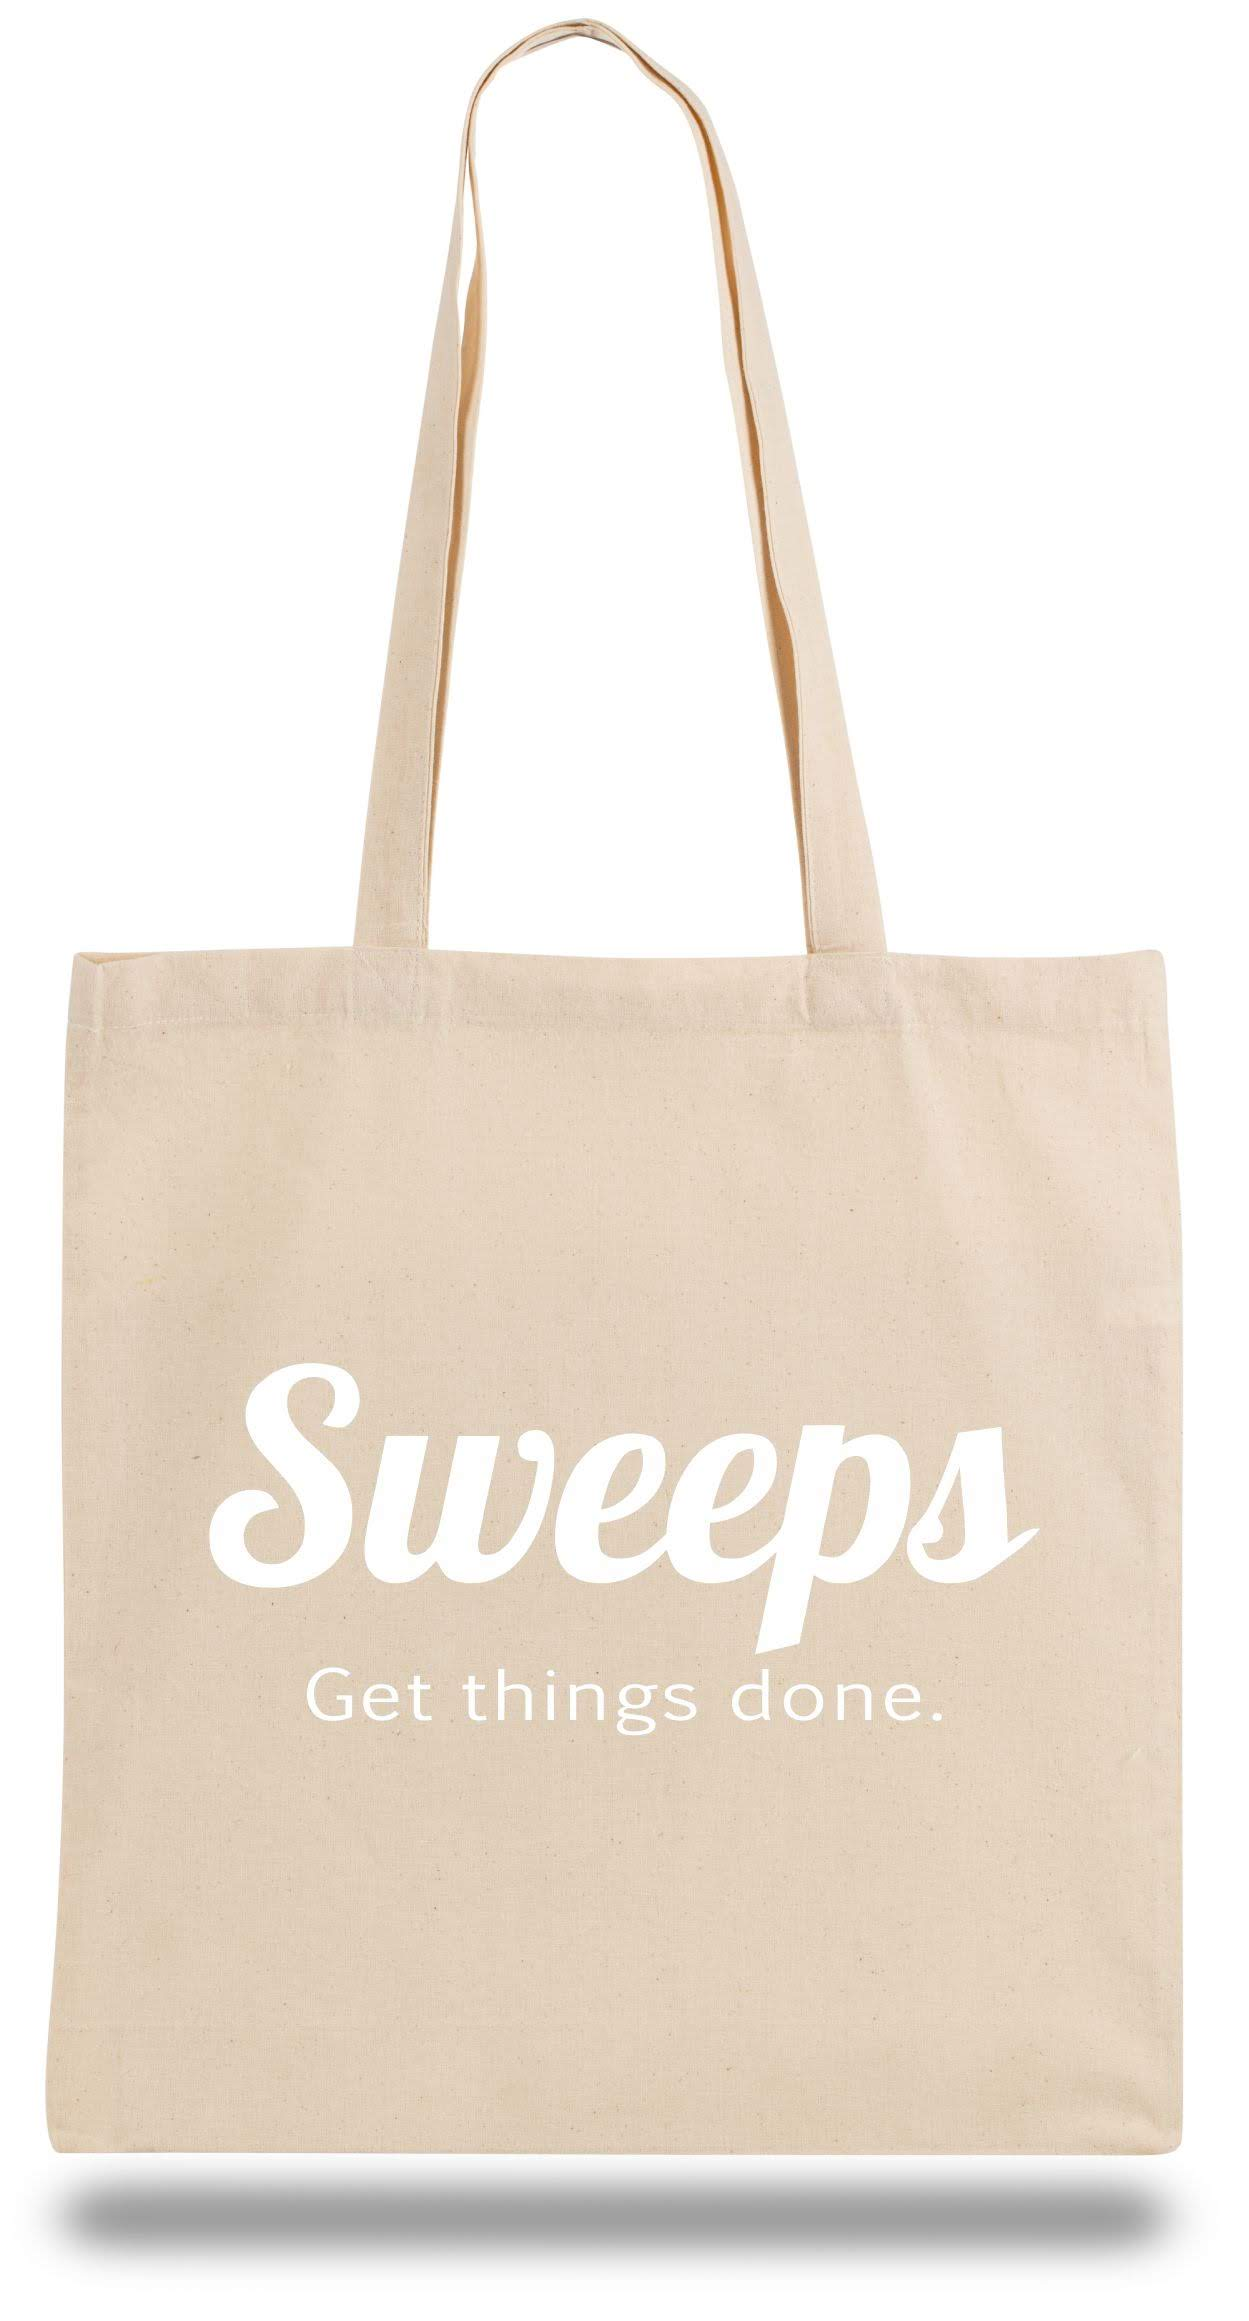 Sweeps Tote